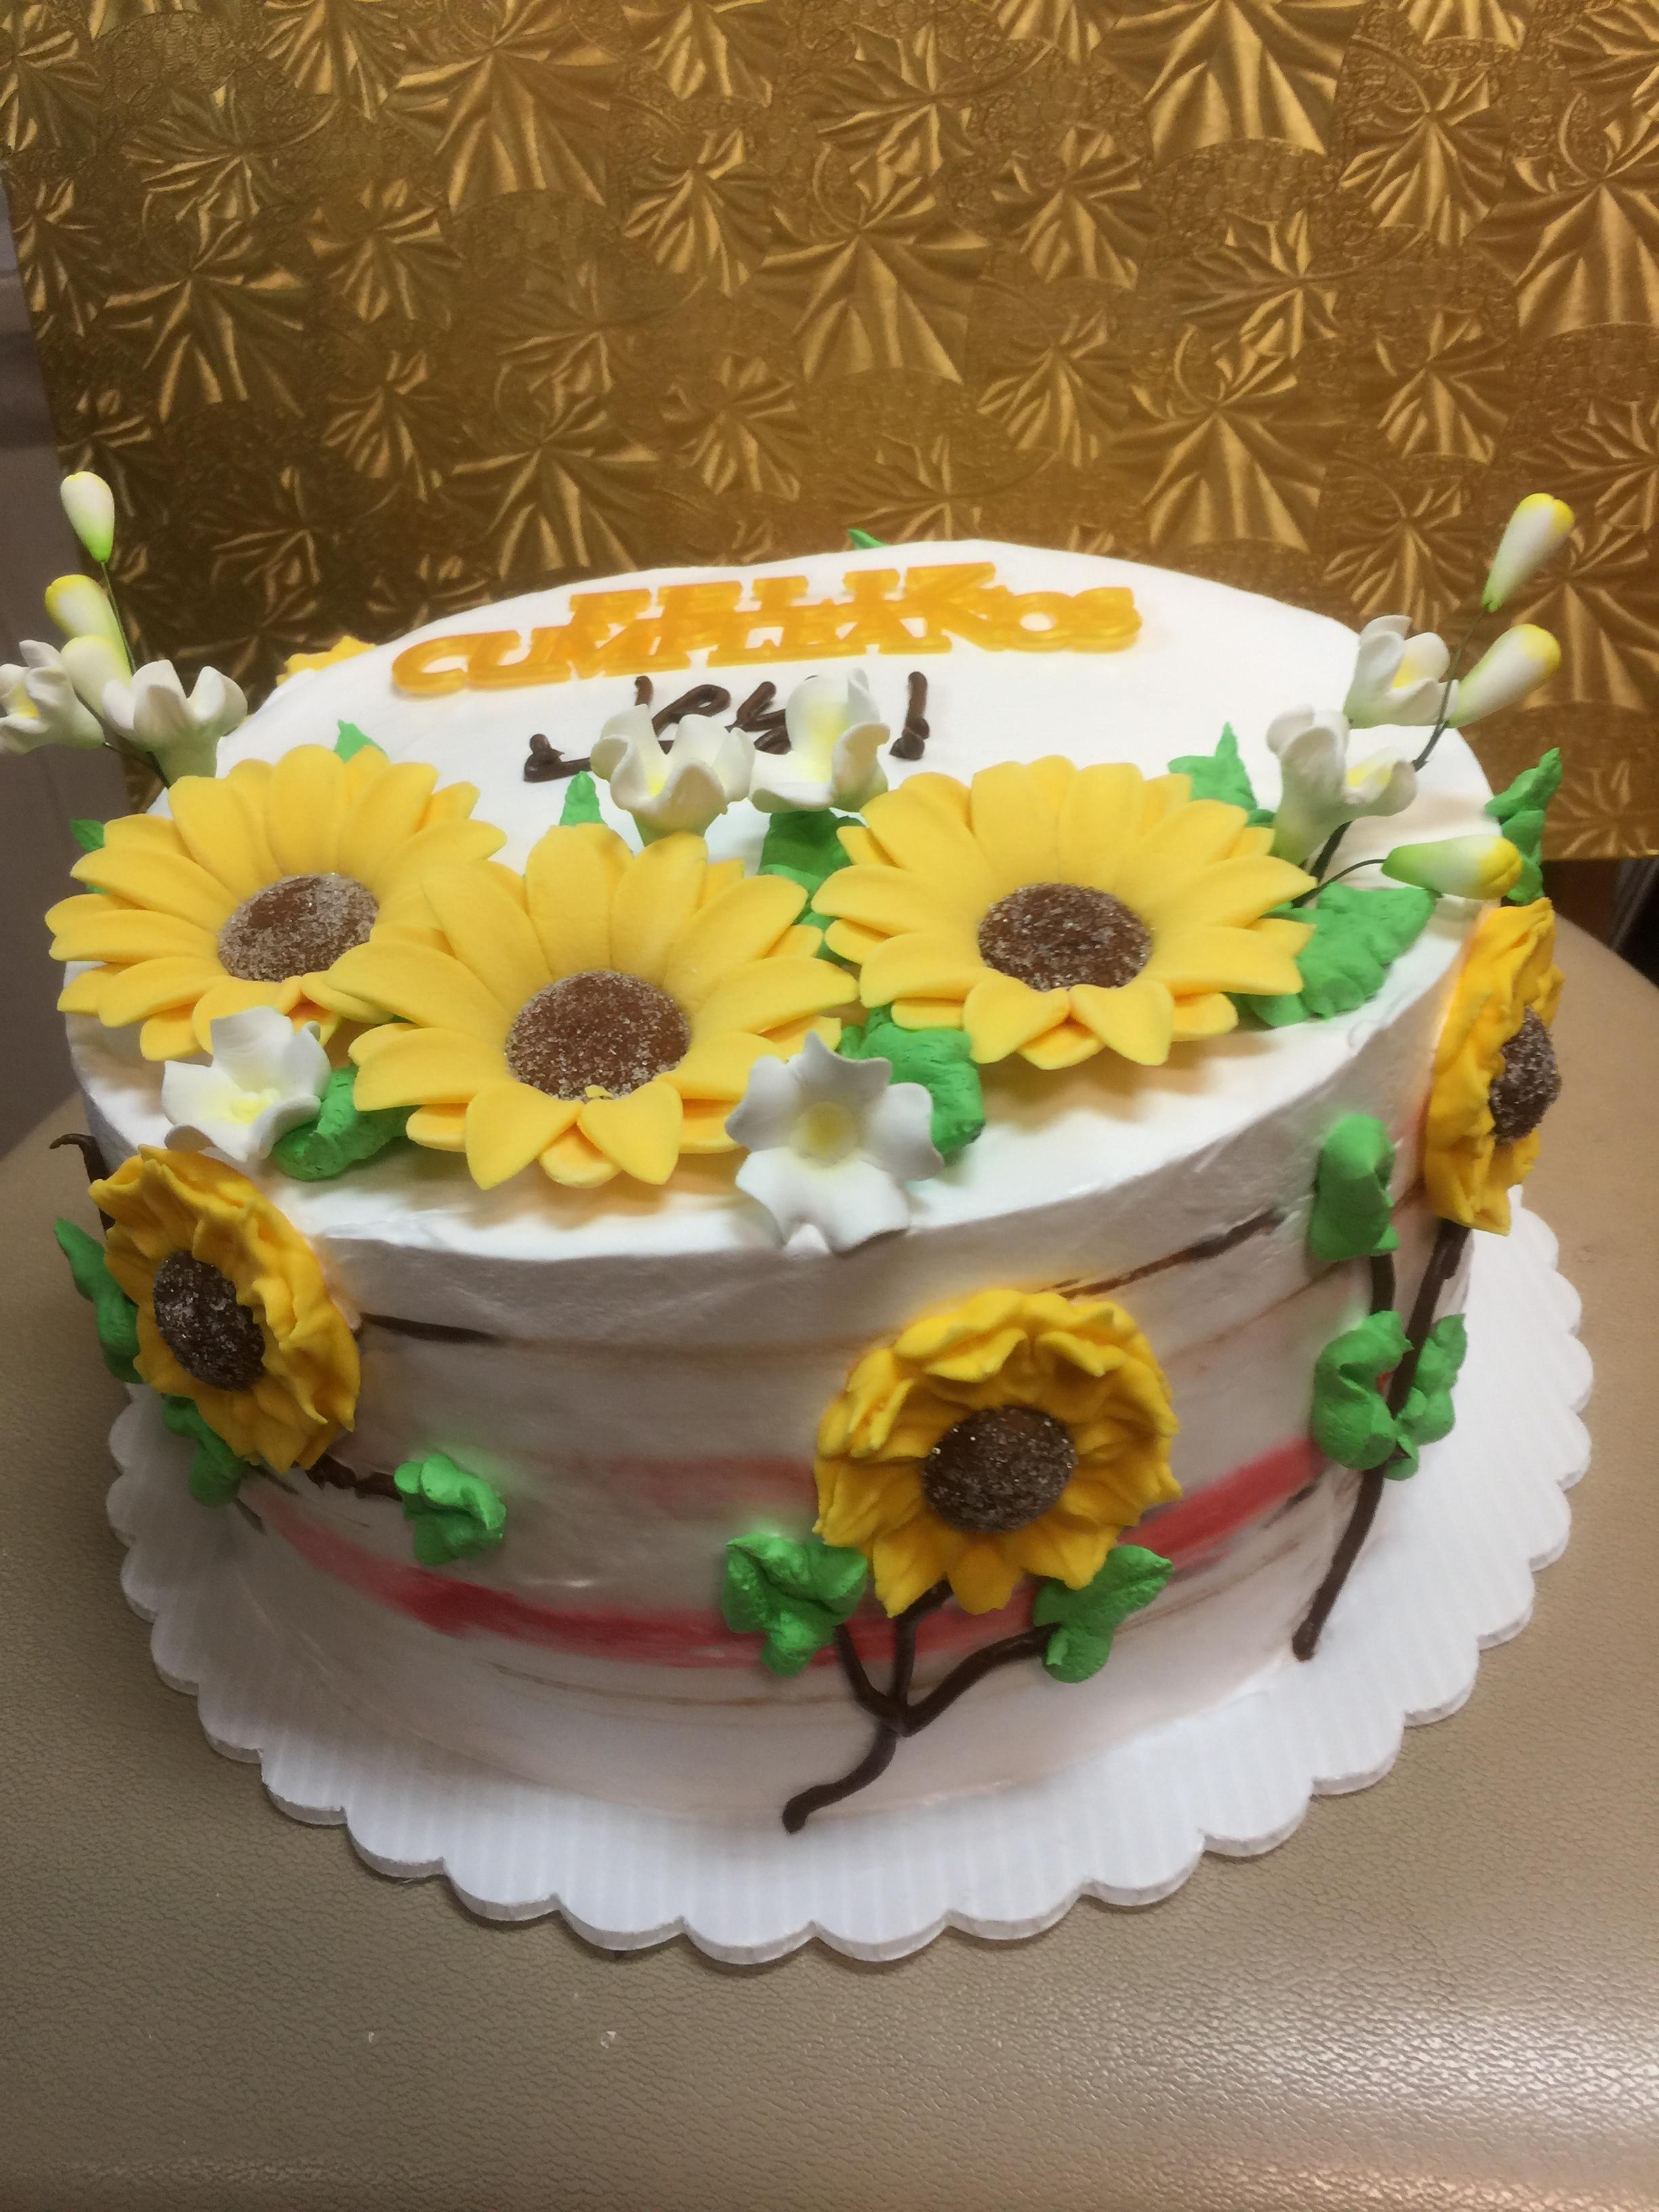 Miraculous Sunflowers Theme Birthday Cake Wild Berries Bakery And Cafe Funny Birthday Cards Online Necthendildamsfinfo